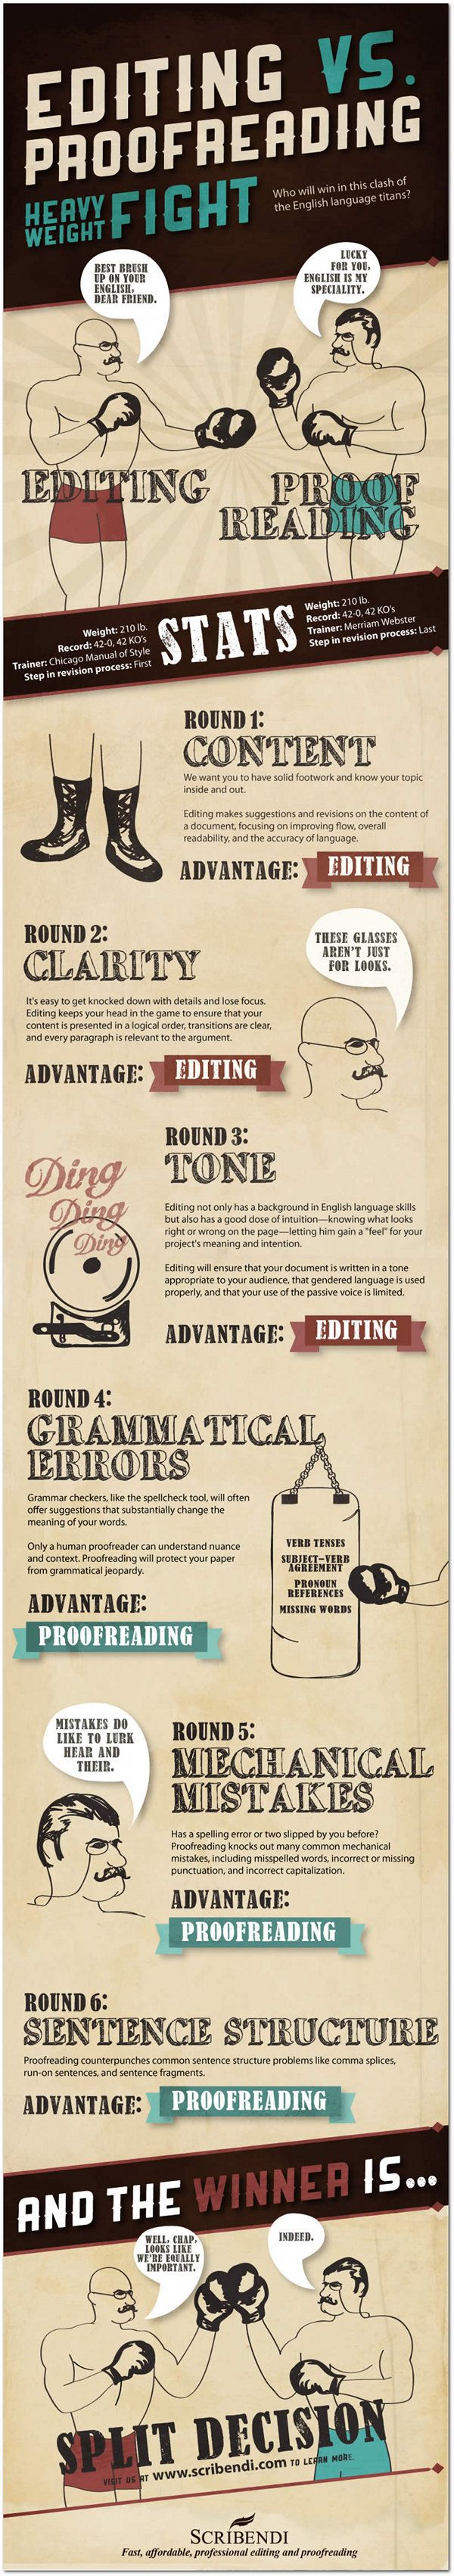 English proof reading